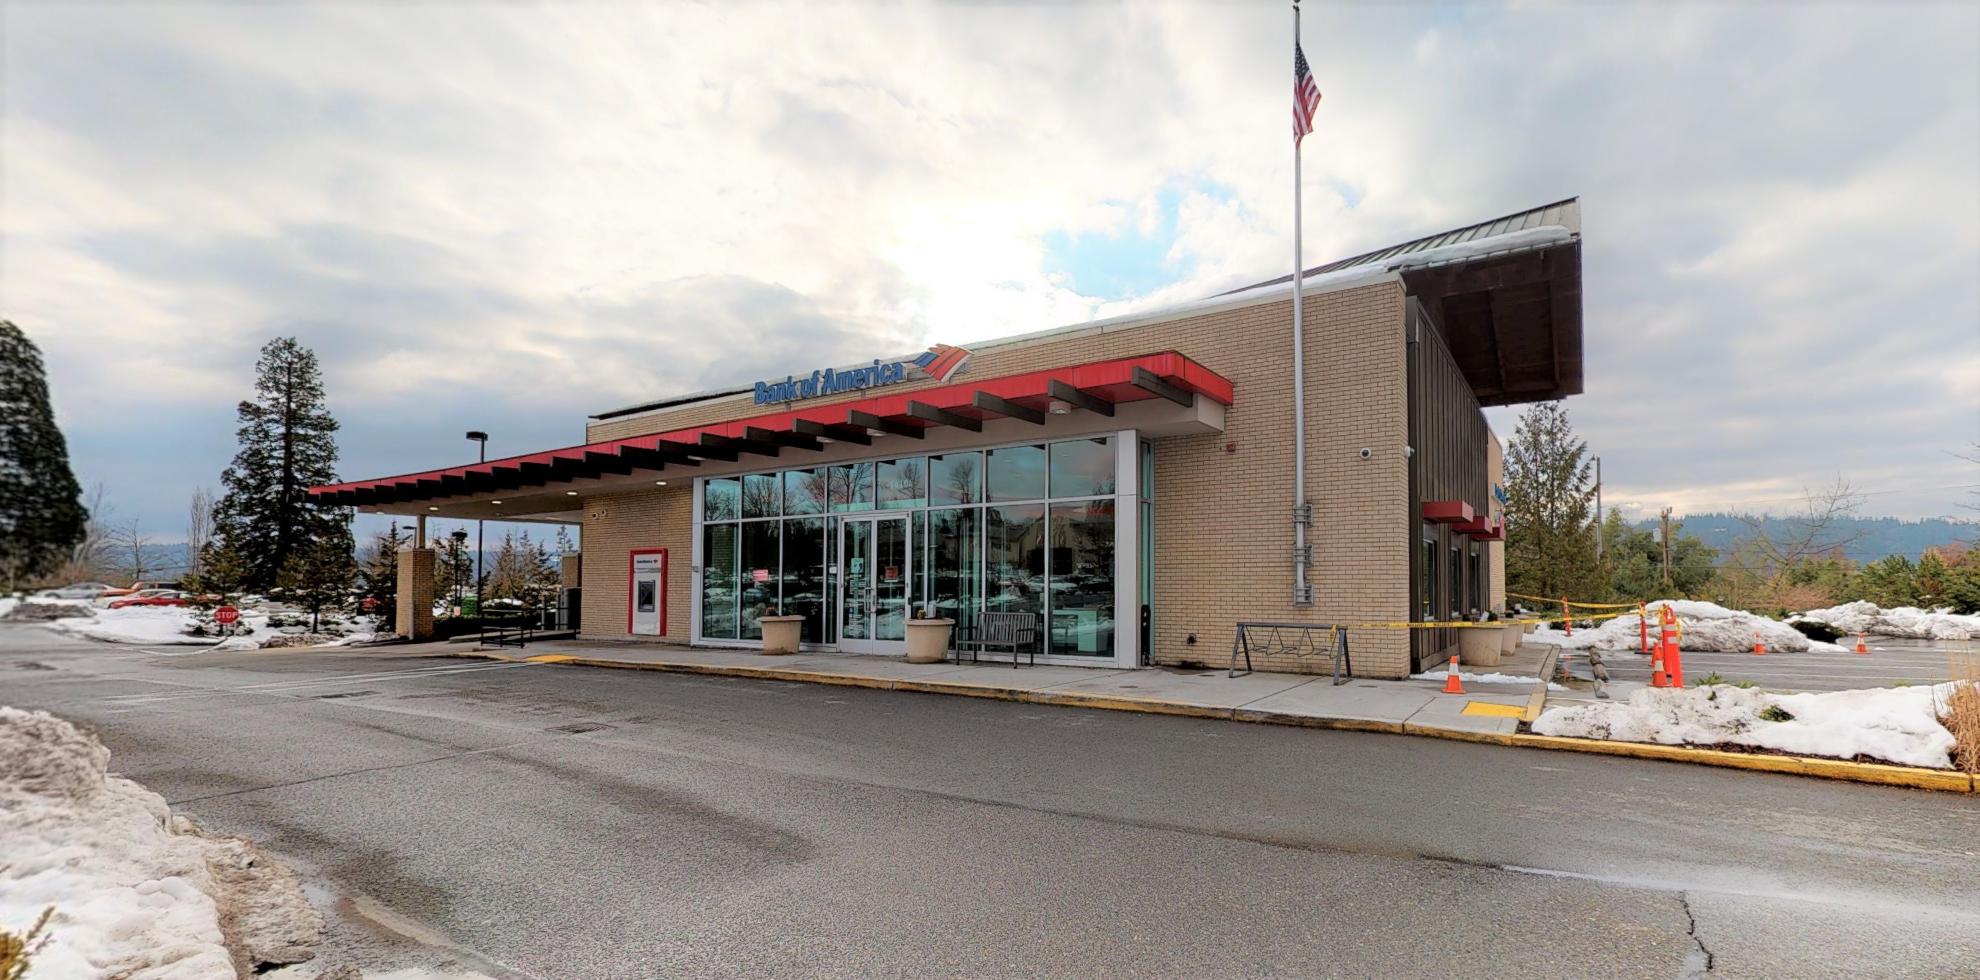 Bank of America financial center with drive-thru ATM | 14104 Main St NE, Duvall, WA 98019